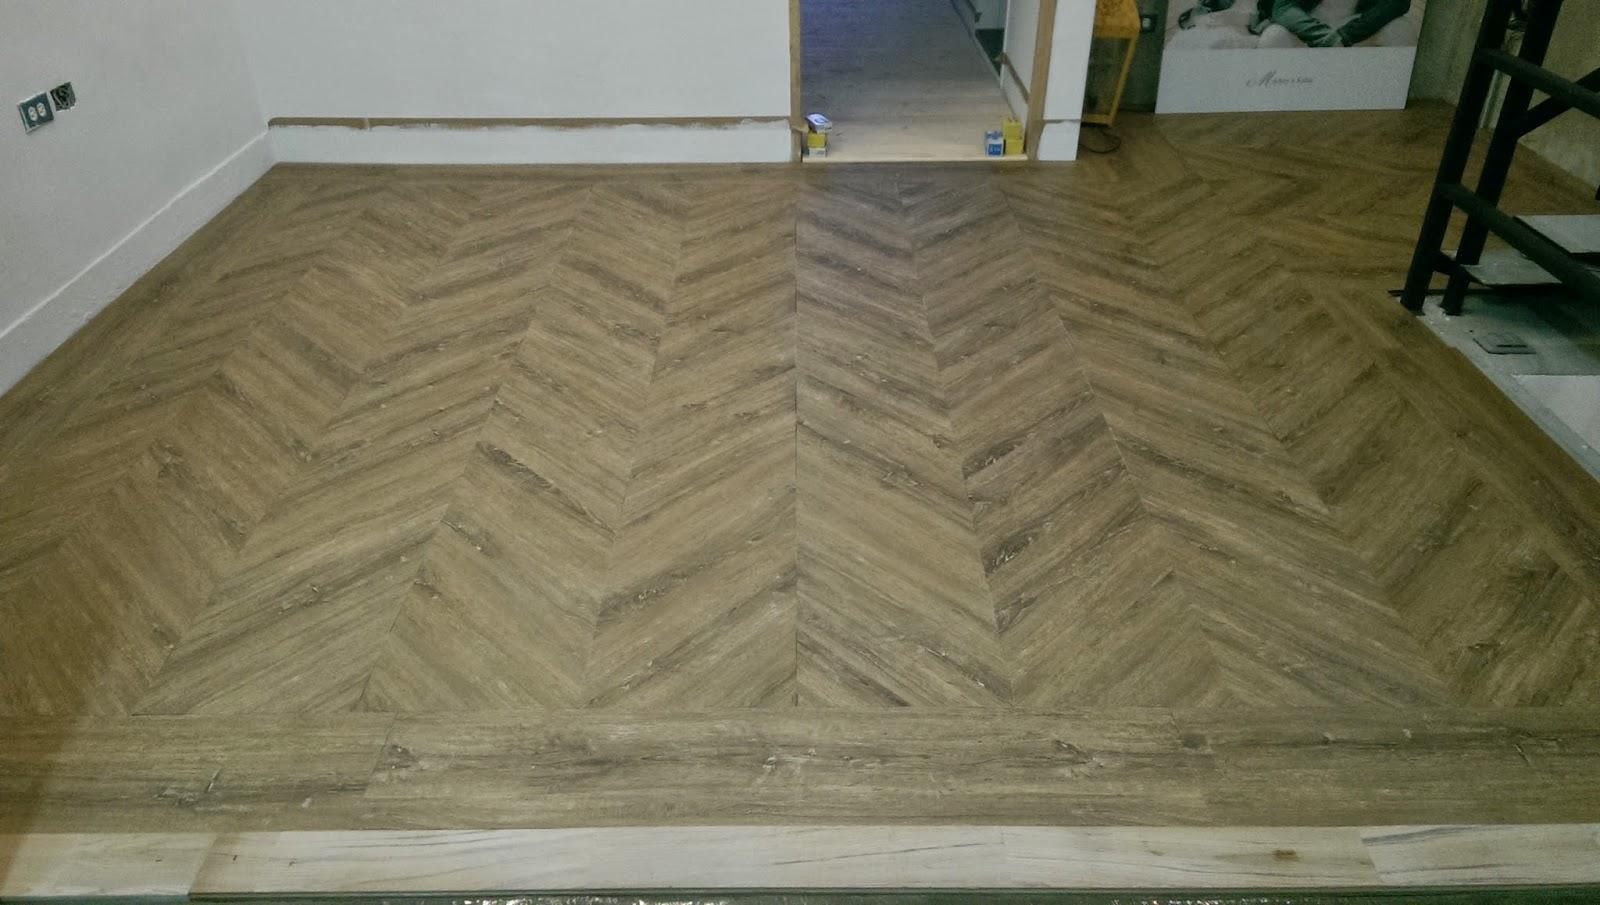 i Do Studio 我做工寓: 目前為止最痛苦的DIY工程-Part 2 比木地板還難搞的塑膠地板